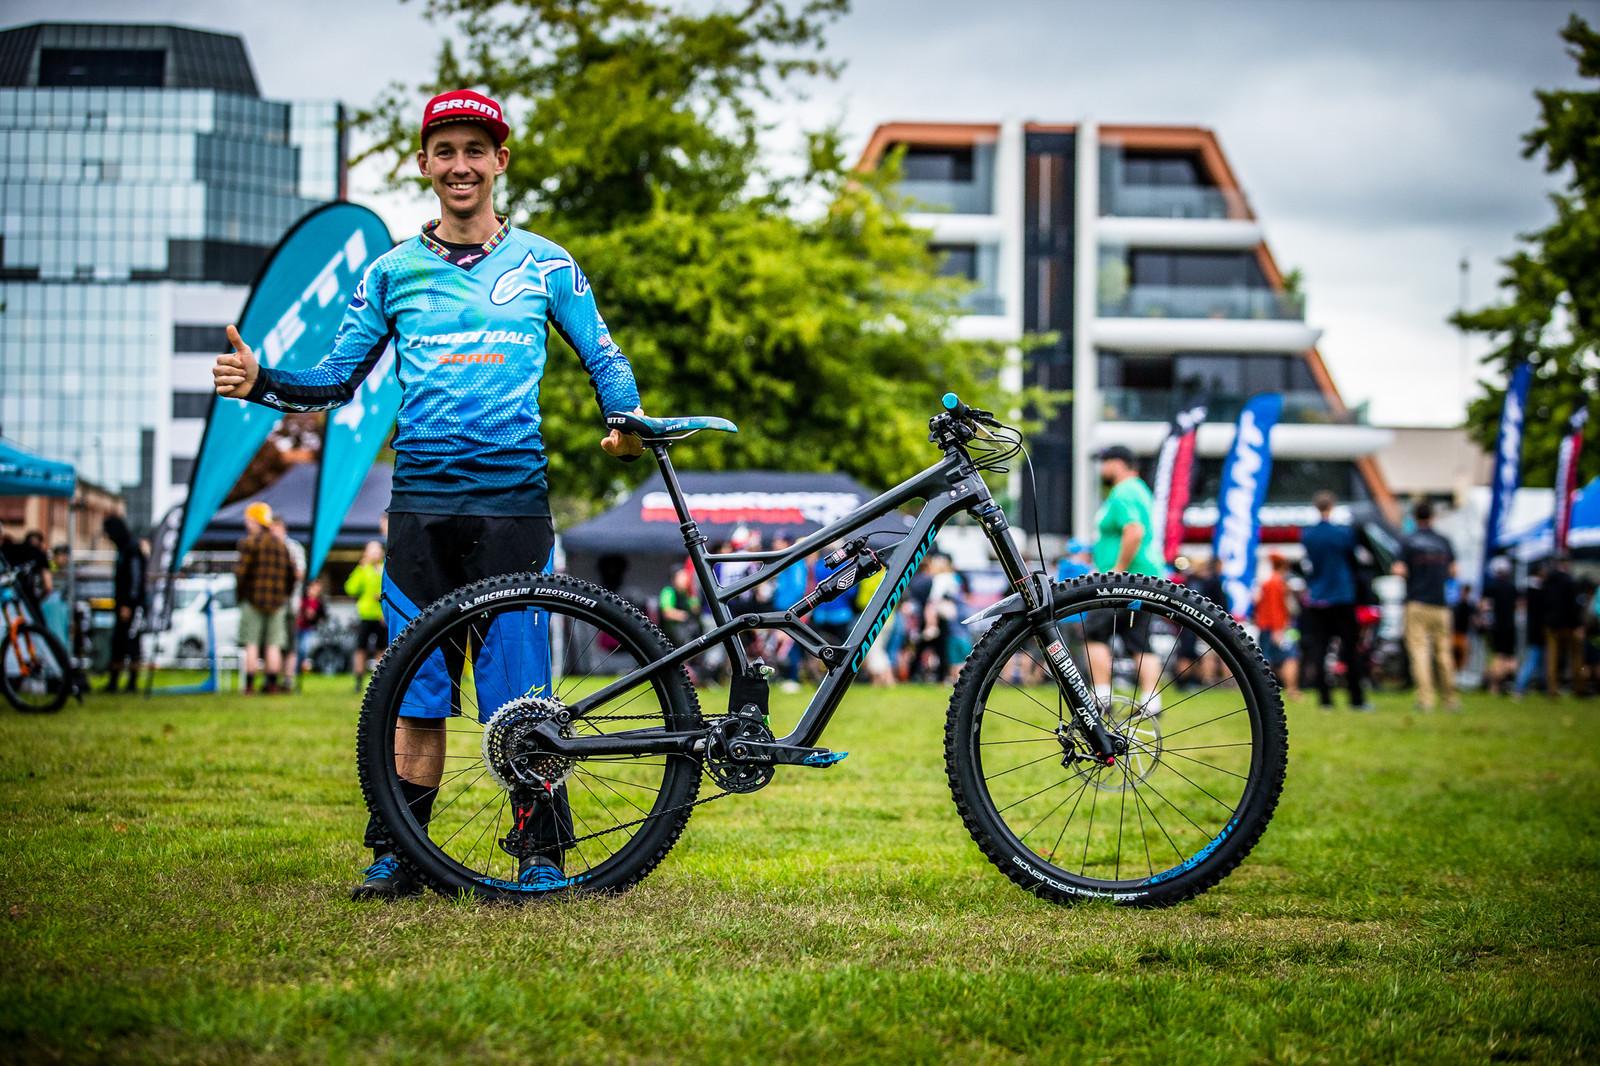 Jerome Clementz and his New Cannondale  - PIT BITS - Enduro World Series, Rotorua, New Zealand - Mountain Biking Pictures - Vital MTB